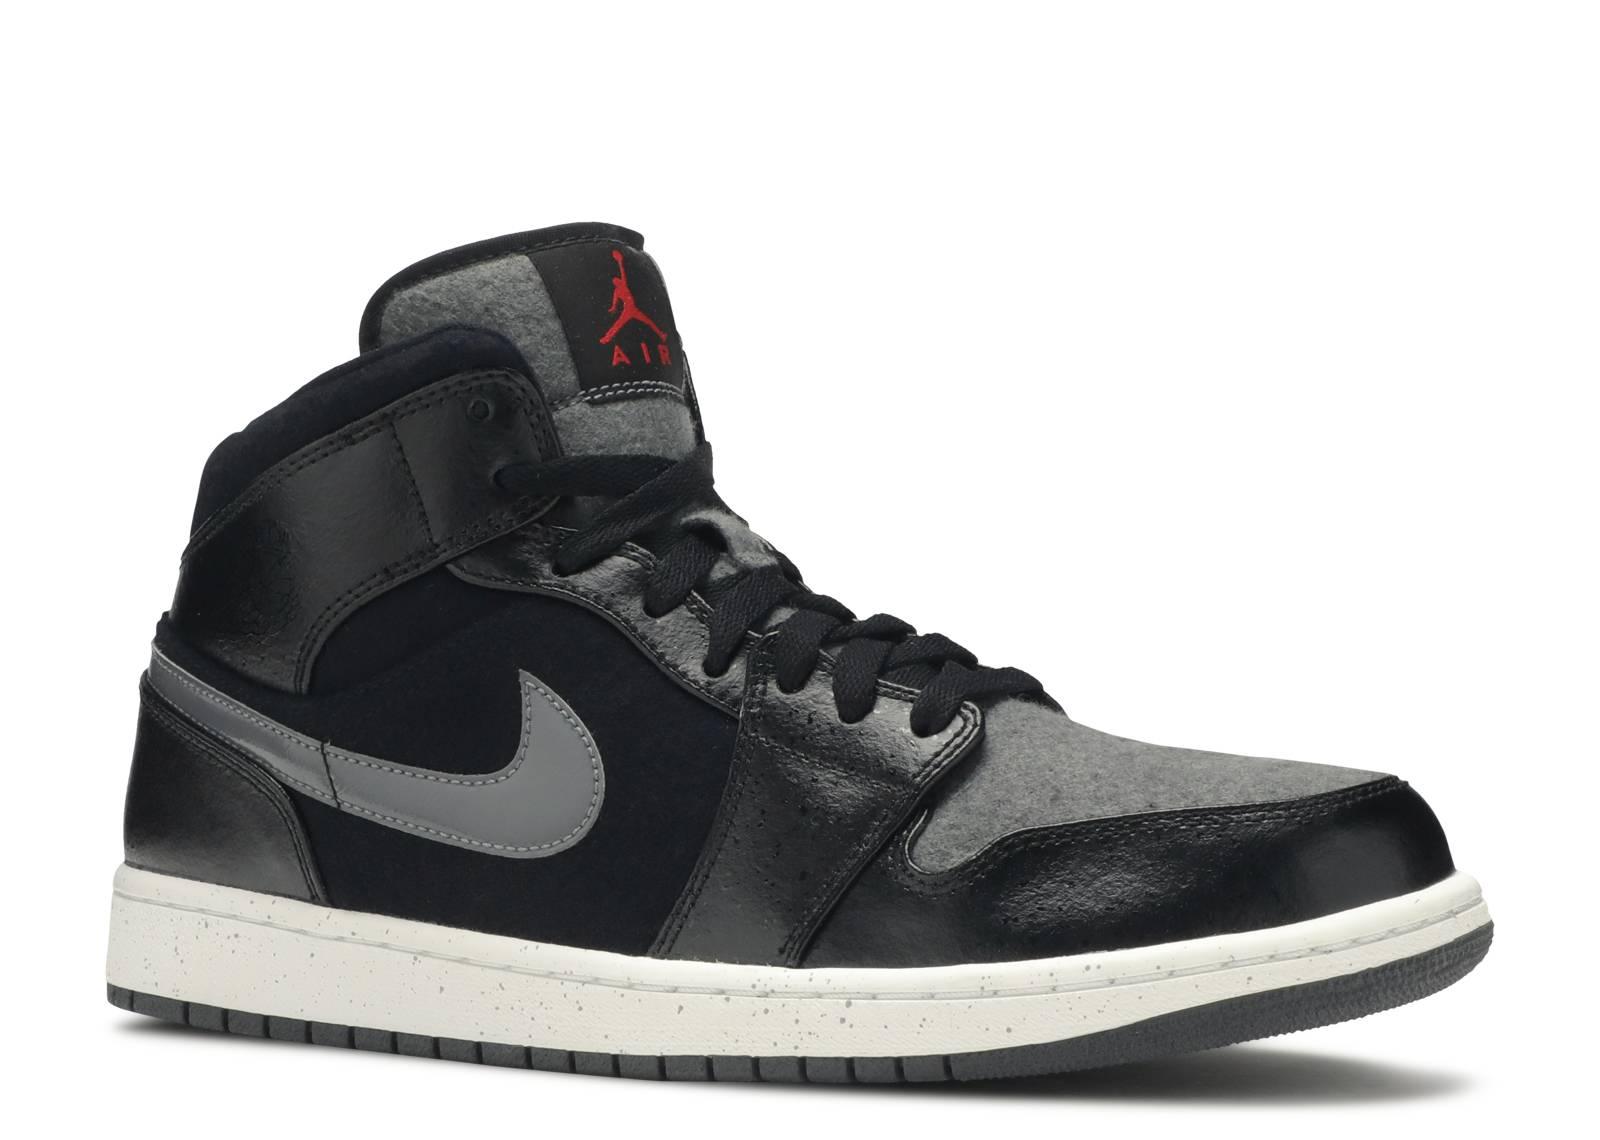 newest 0d3e1 68290 Jordan 1 - Air Jordan - 852542 001 - black gym red- dark grey- white    Flight Club